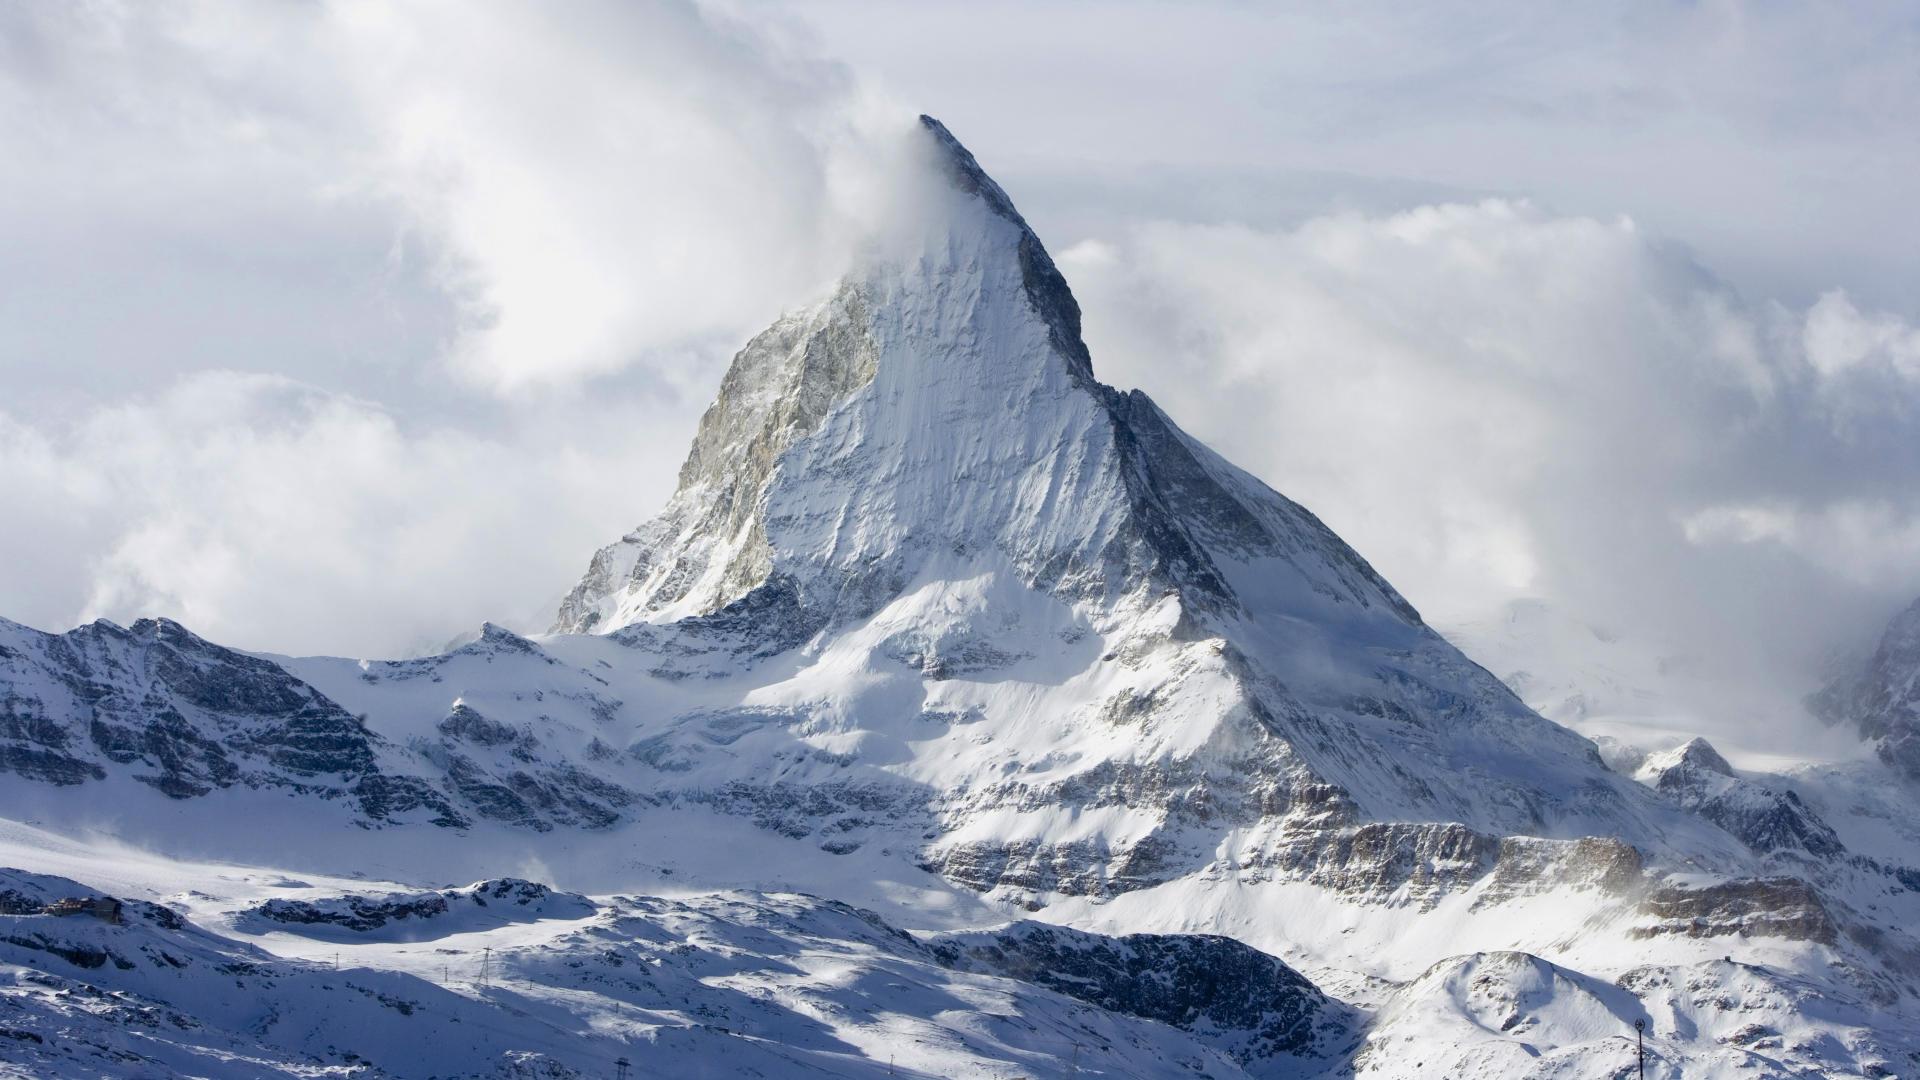 Гора Маттерхорн укрыта снегом